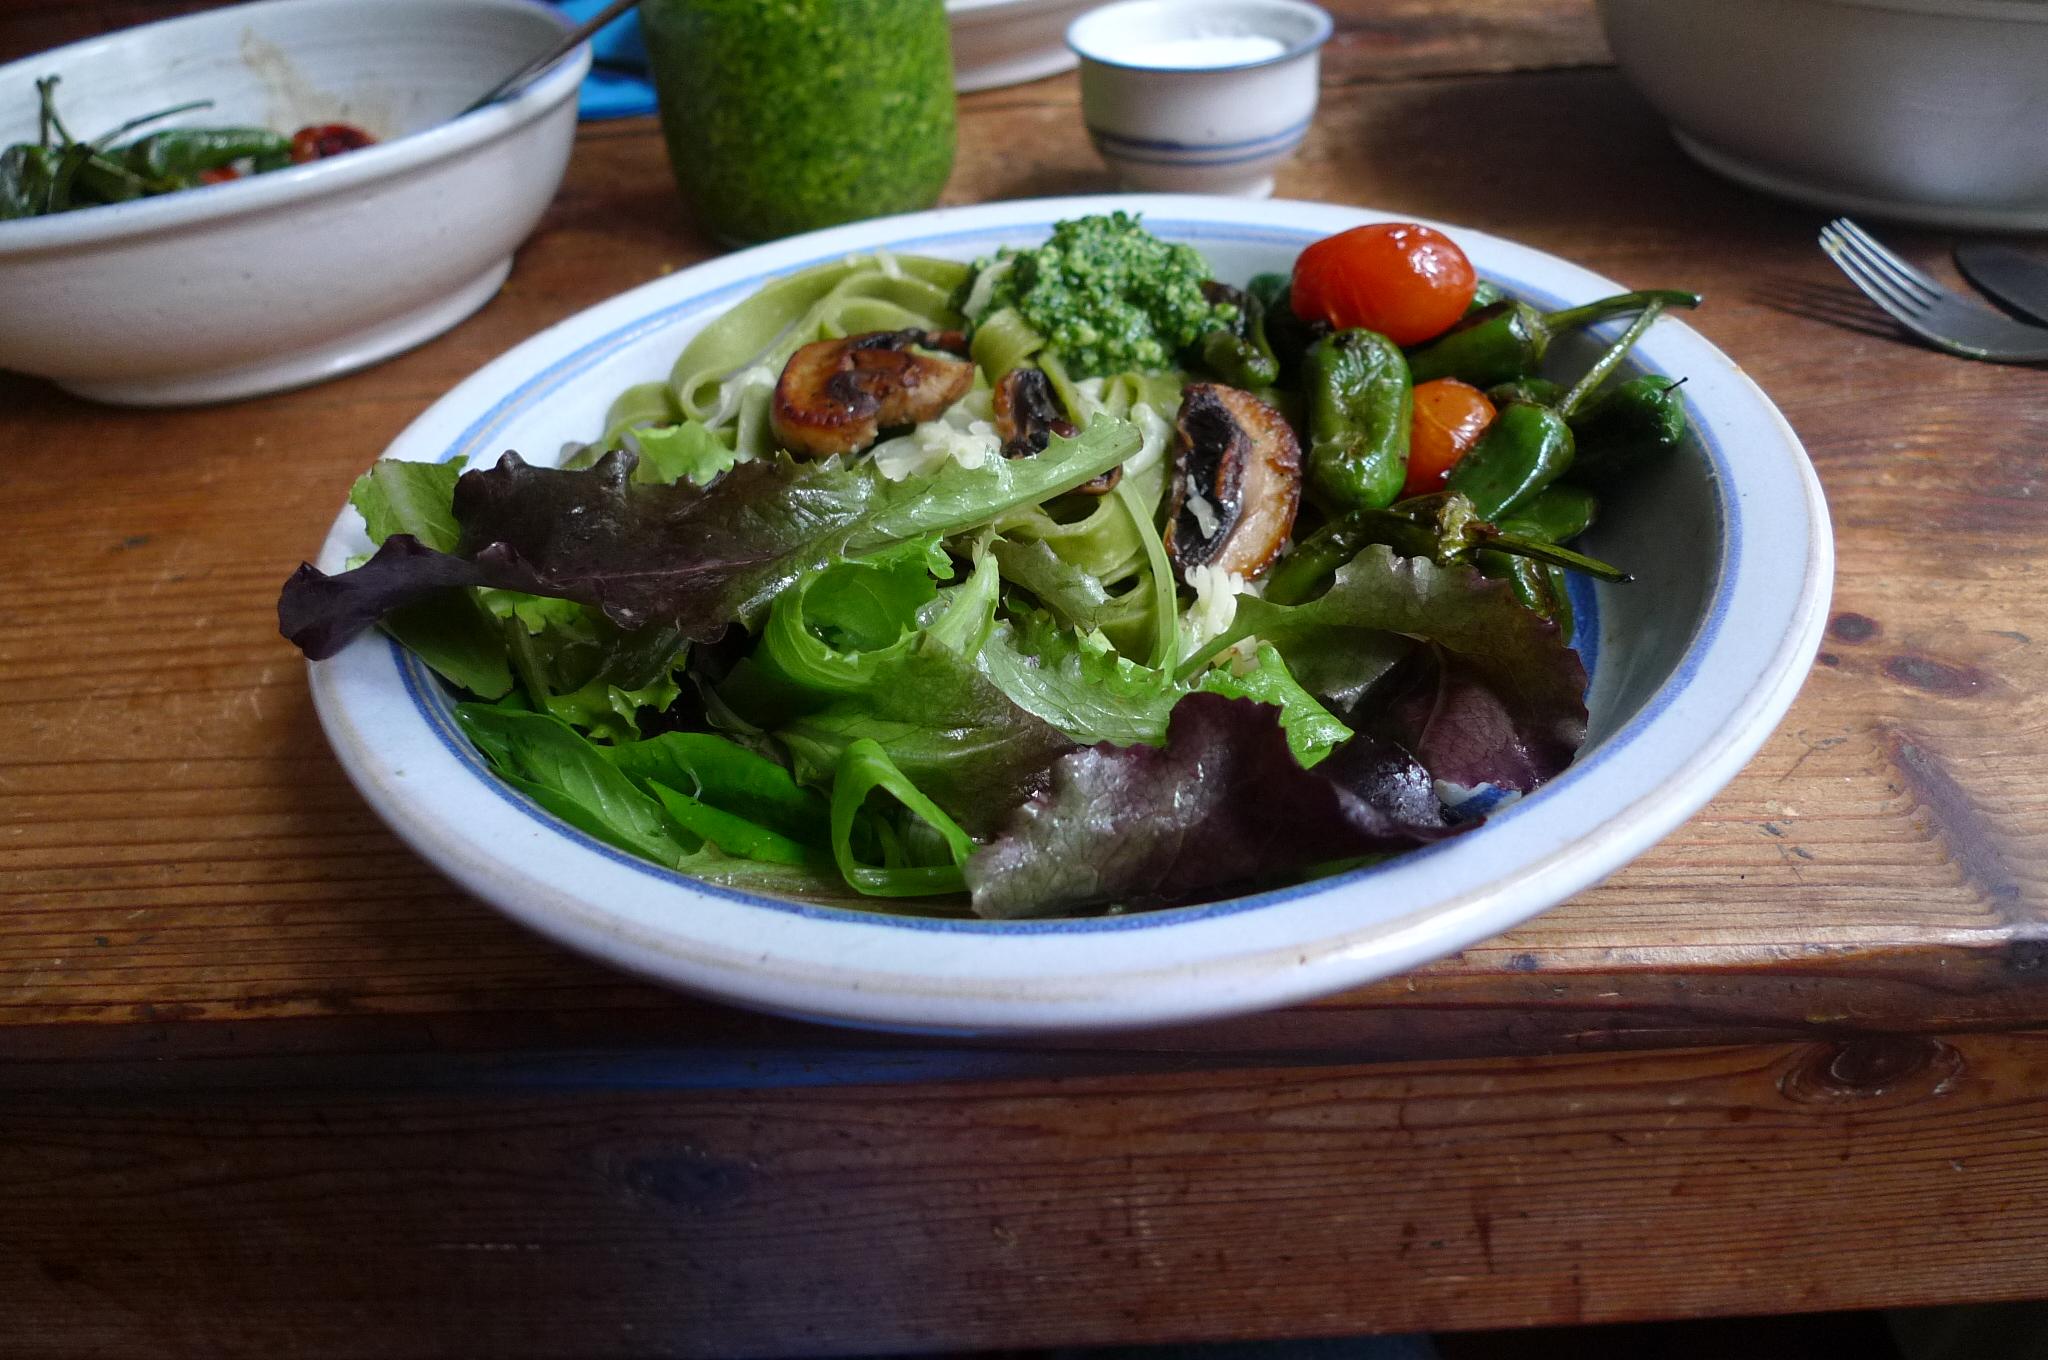 Grüne Nudeln,Ruccolapesto,Pilze,Bratpaprika,Salat-8.3.15   (10)